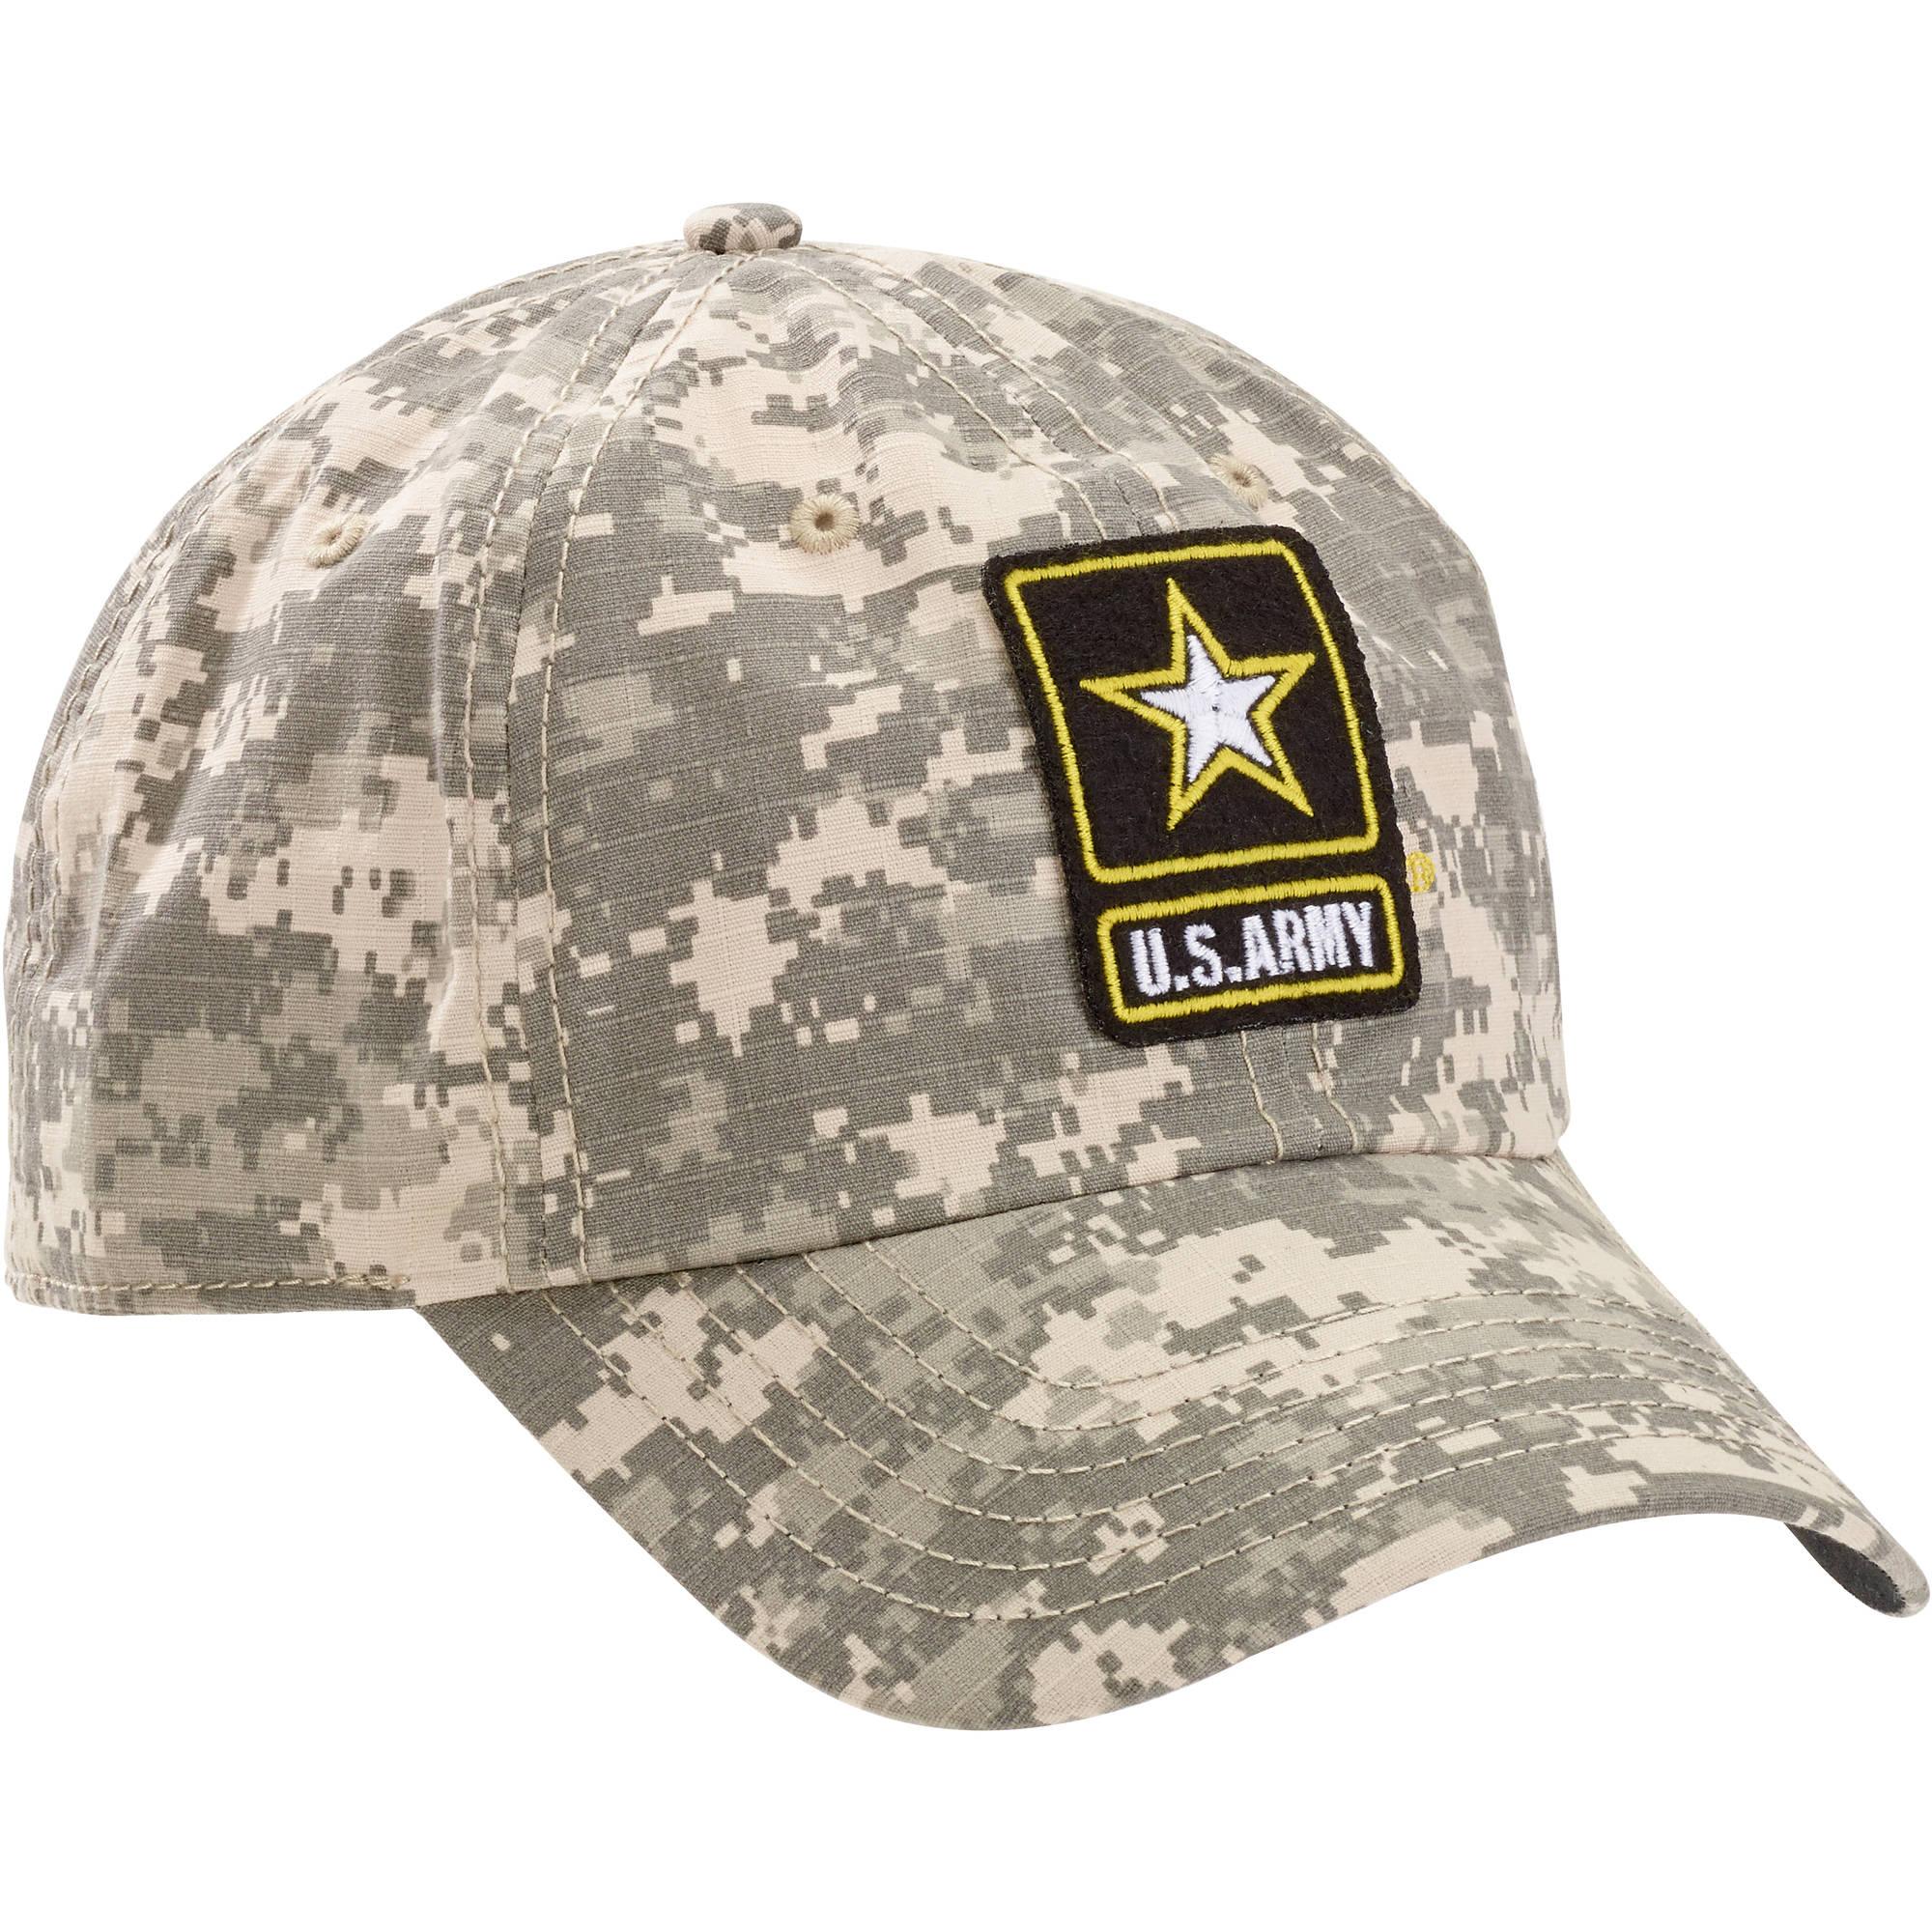 Men's Army Digi Camo Hat